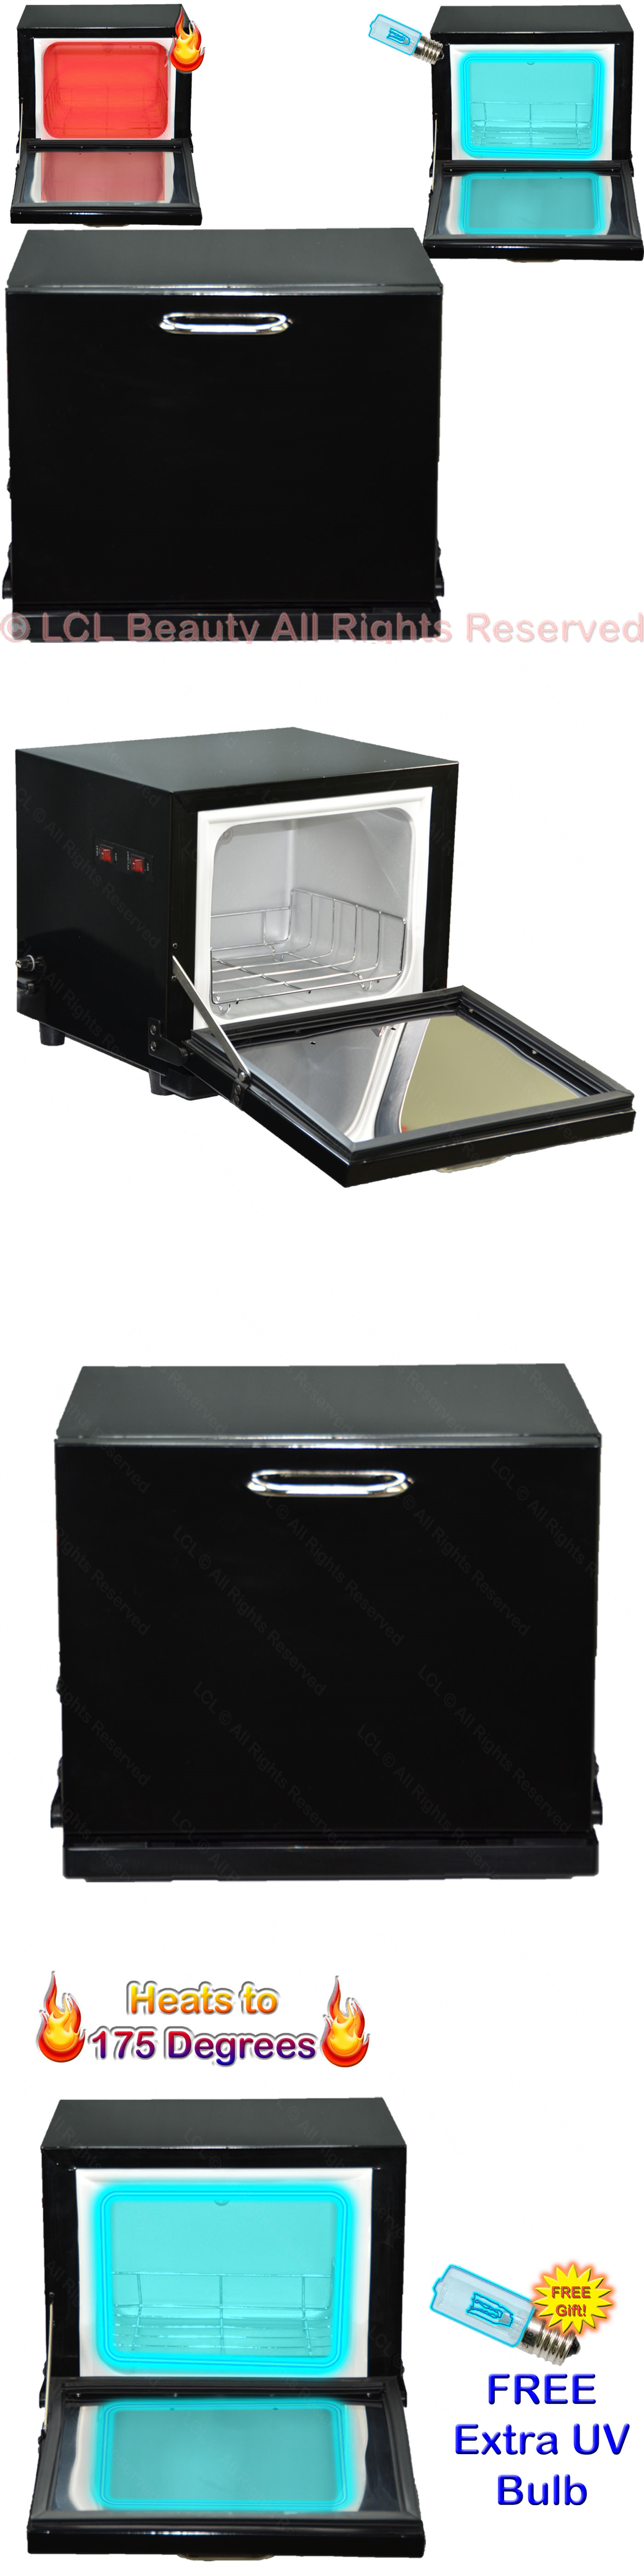 Sterilizers and Towel Warmers: Mini Uv Hot Towel Warmer Cabinet Sanitizer Sterilizer Beauty Salon Equipment - B -> BUY IT NOW ONLY: $79.88 on eBay!